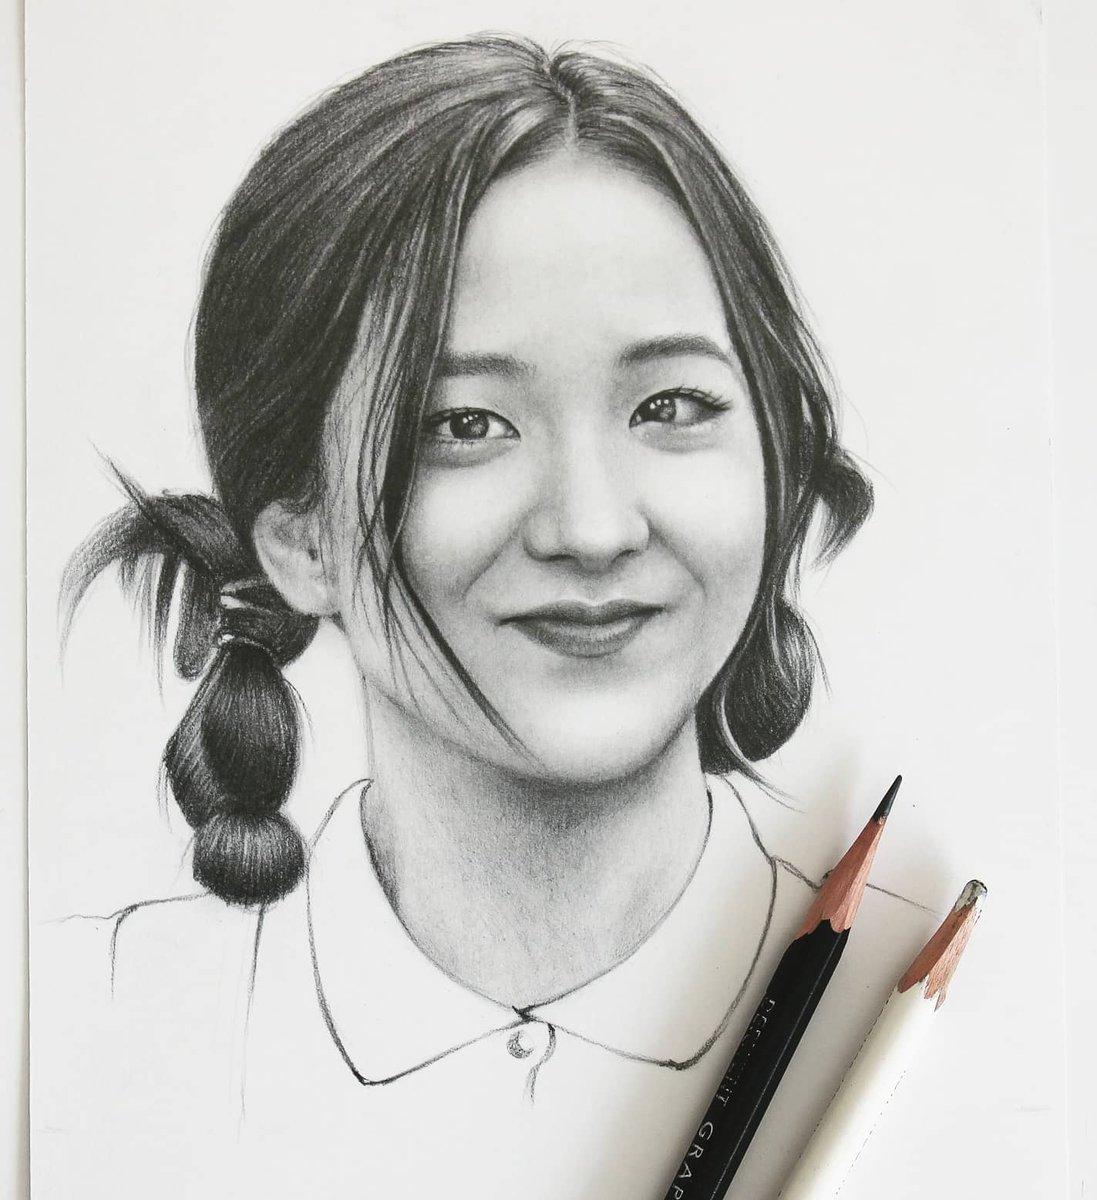 Cute Jisoo #blackpinkfanart #JISOO #BLACKPINK #cute #drawing #ArtistOnTwitter